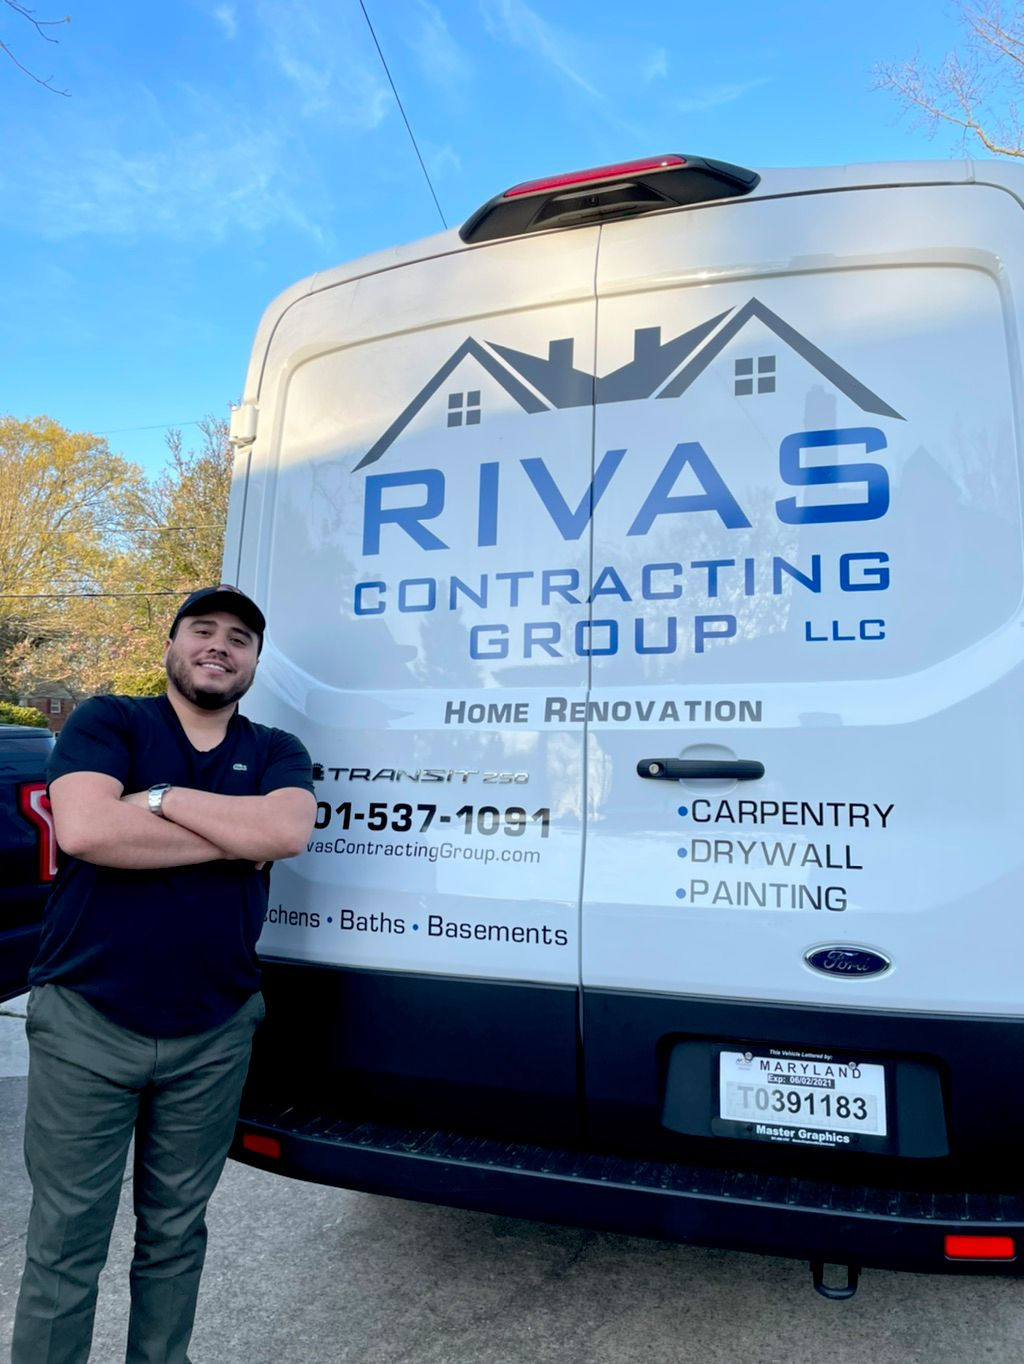 Rivas Contracting Group LLC